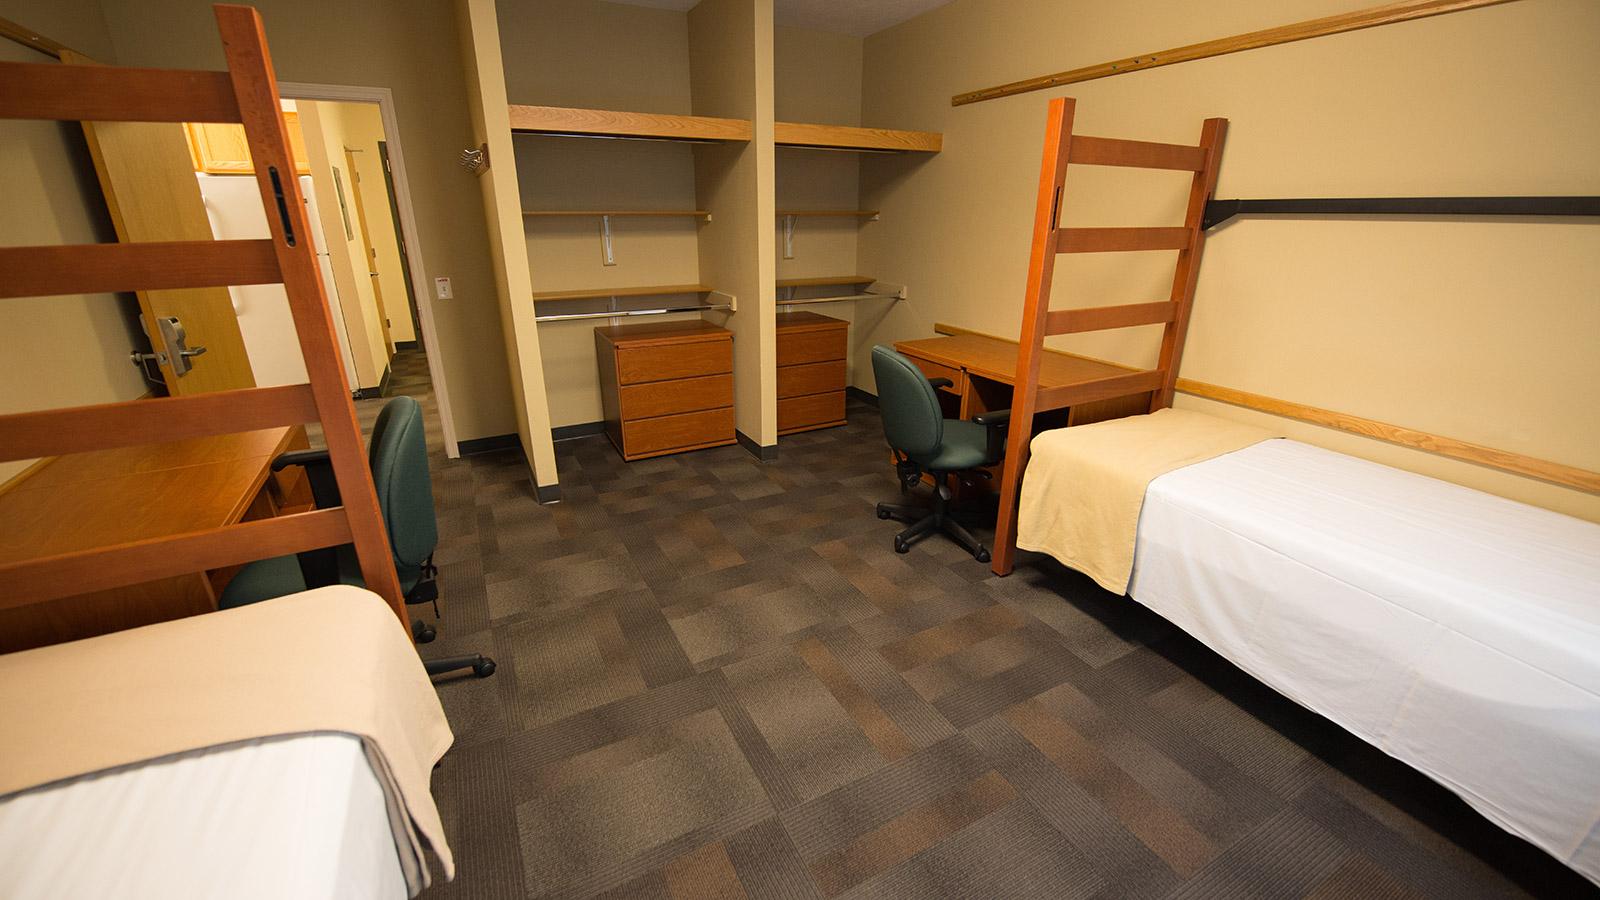 Interior of double room.